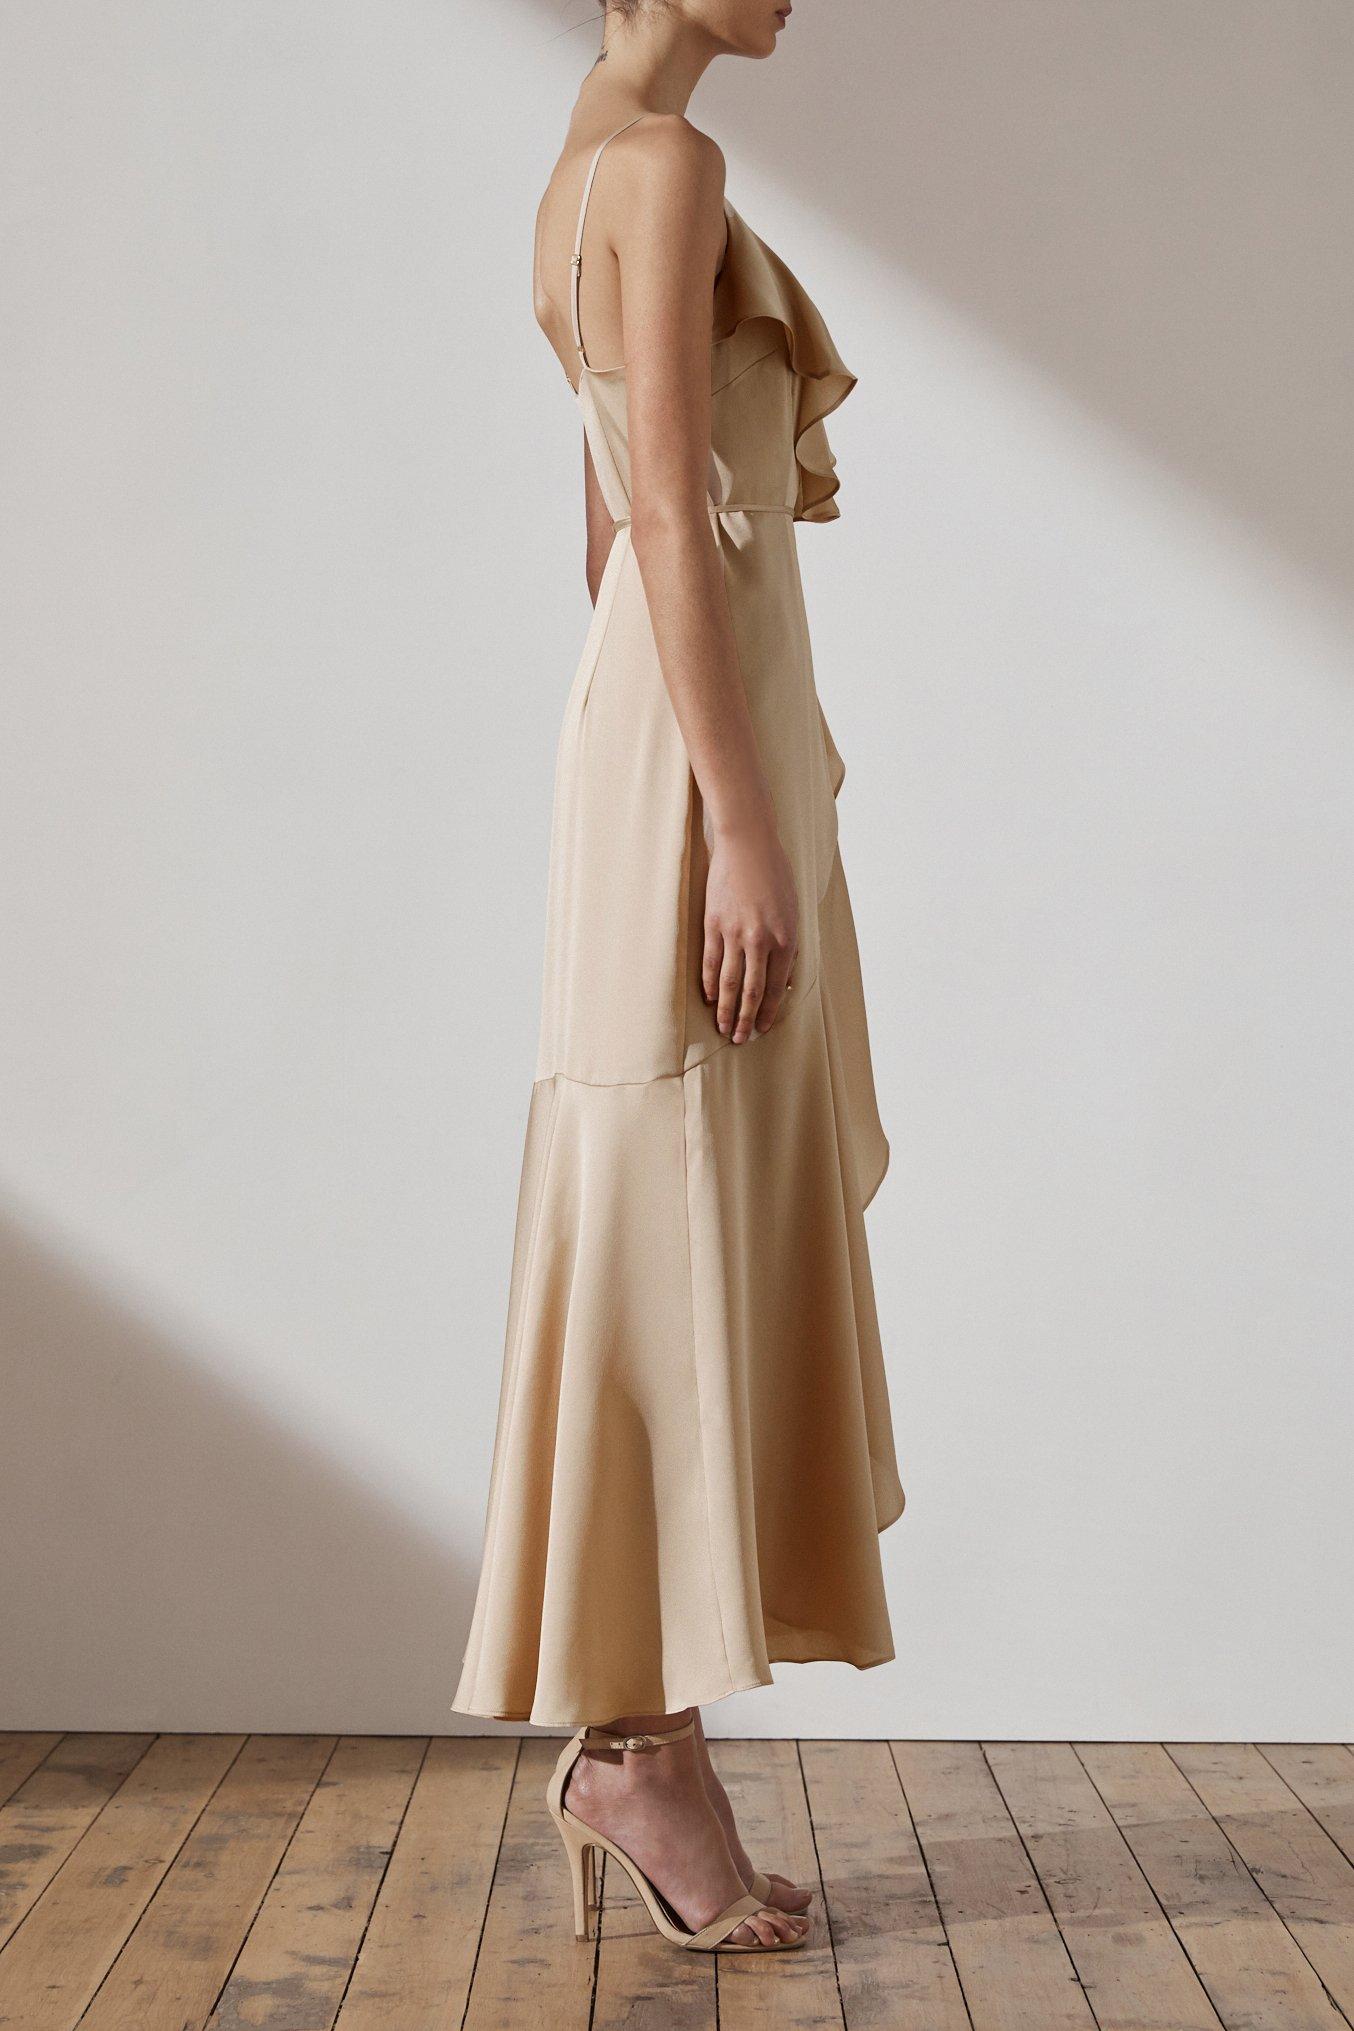 Evie Luxe Bias Frill Wrap Dress by Shona Joy - Champagne